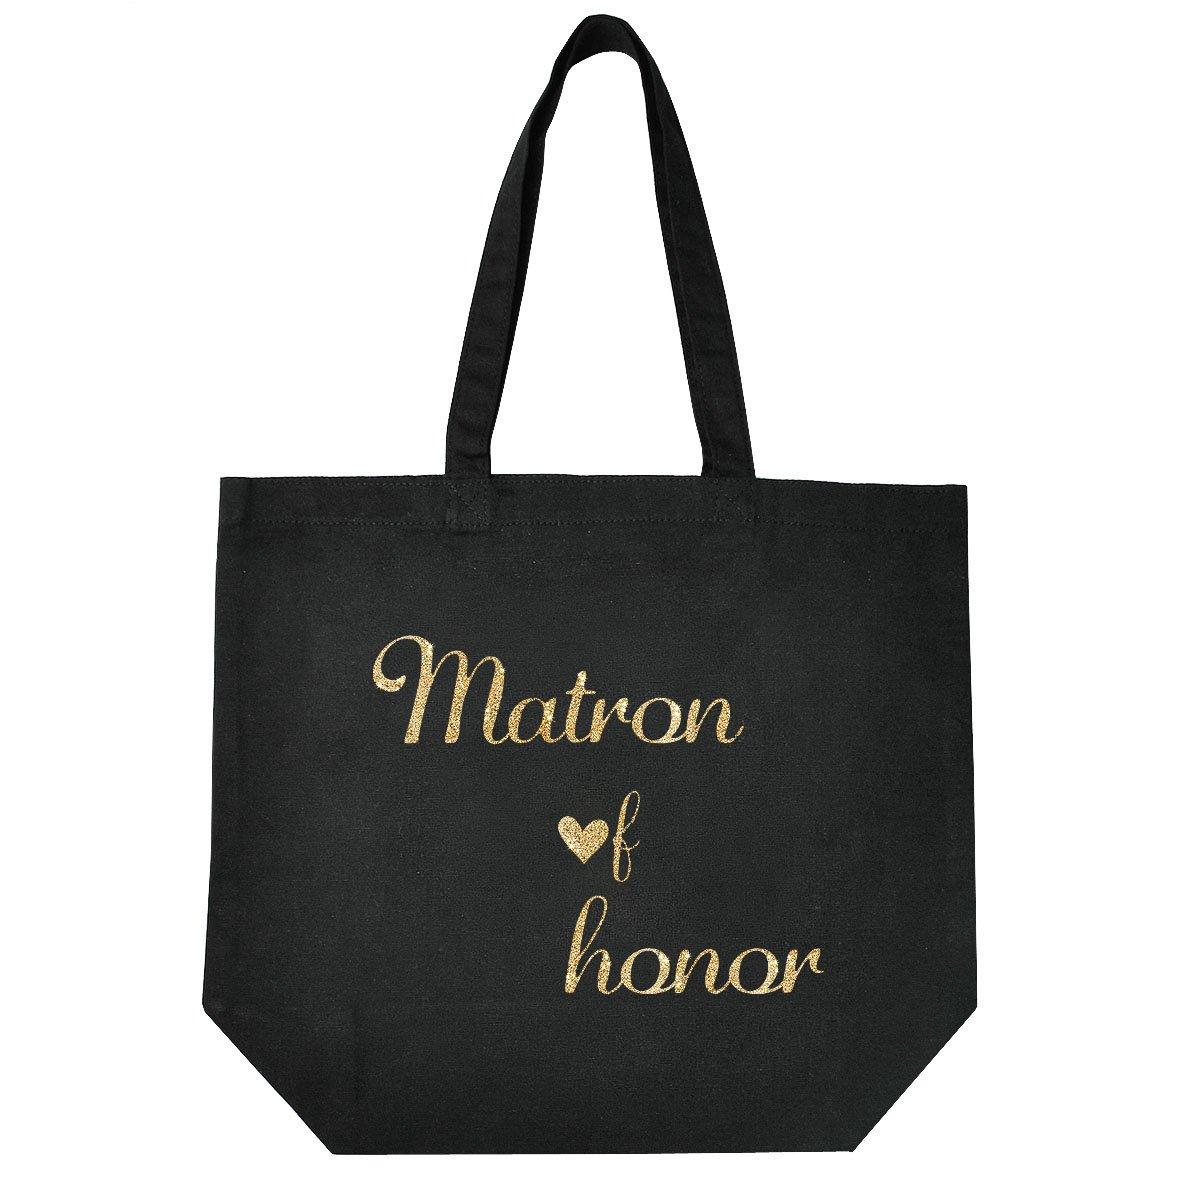 ElegantPark Matron of Honor Tote Wedding Gifts Bridal Shower Bag 100% Cotton Black with Gold Glitter